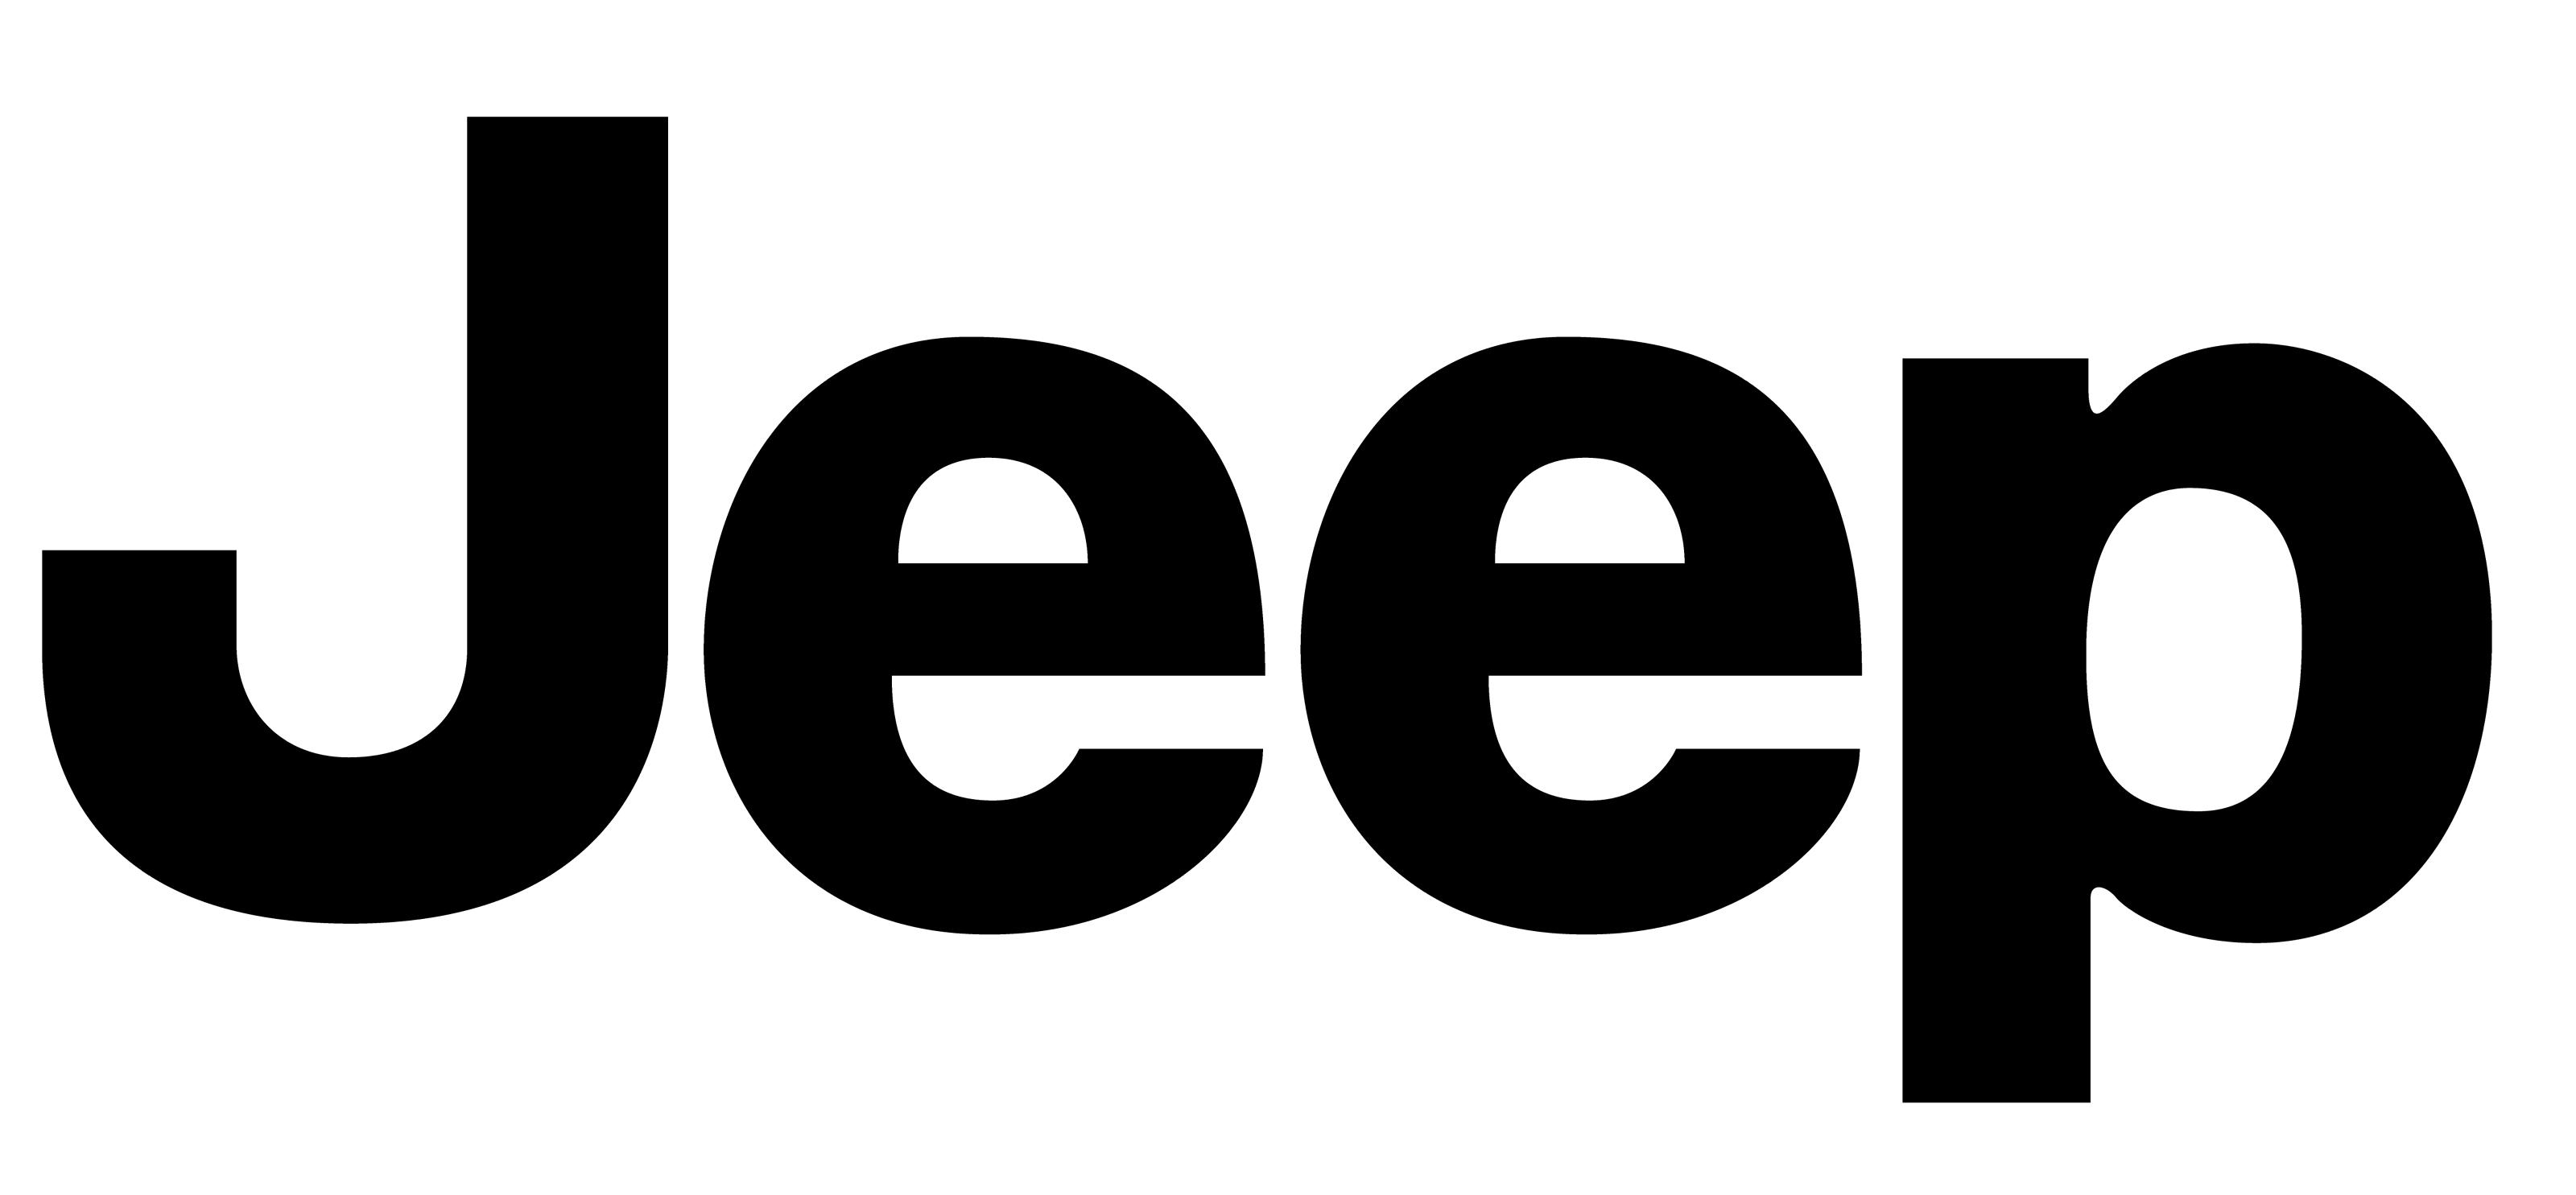 Jeep Car Logo PNG Image